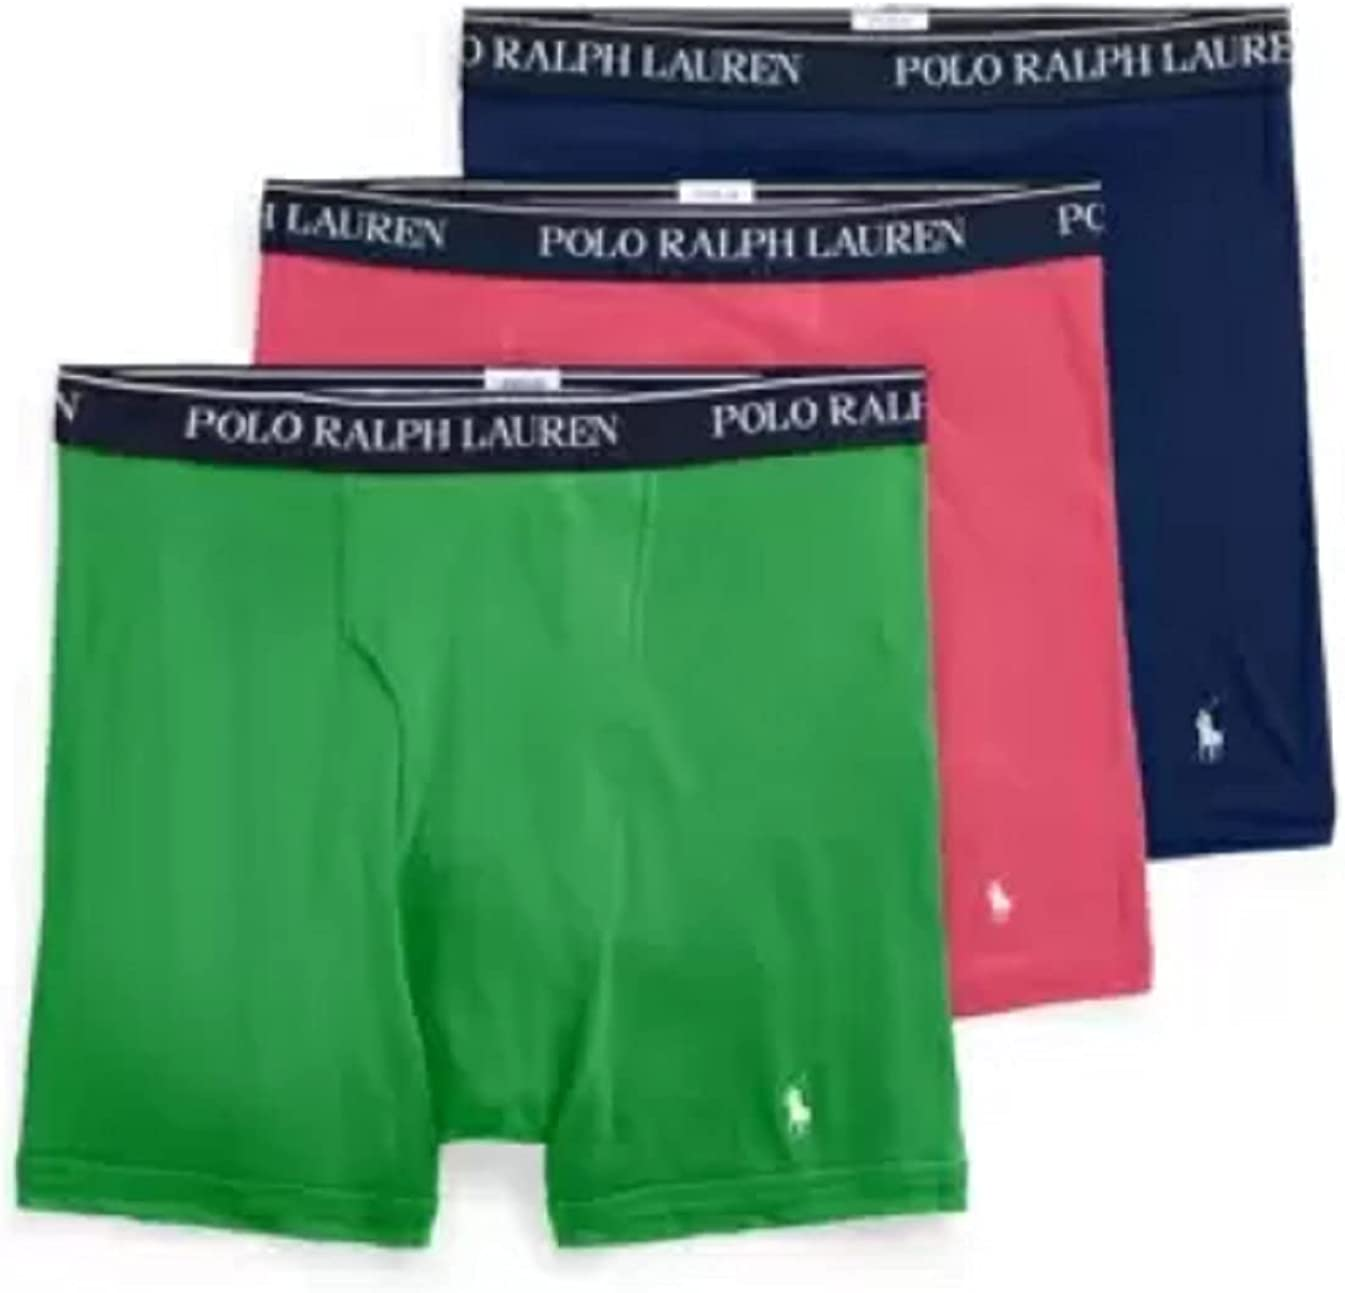 Polo Ralph Lauren Men's 3-Pack Boxer Briefs